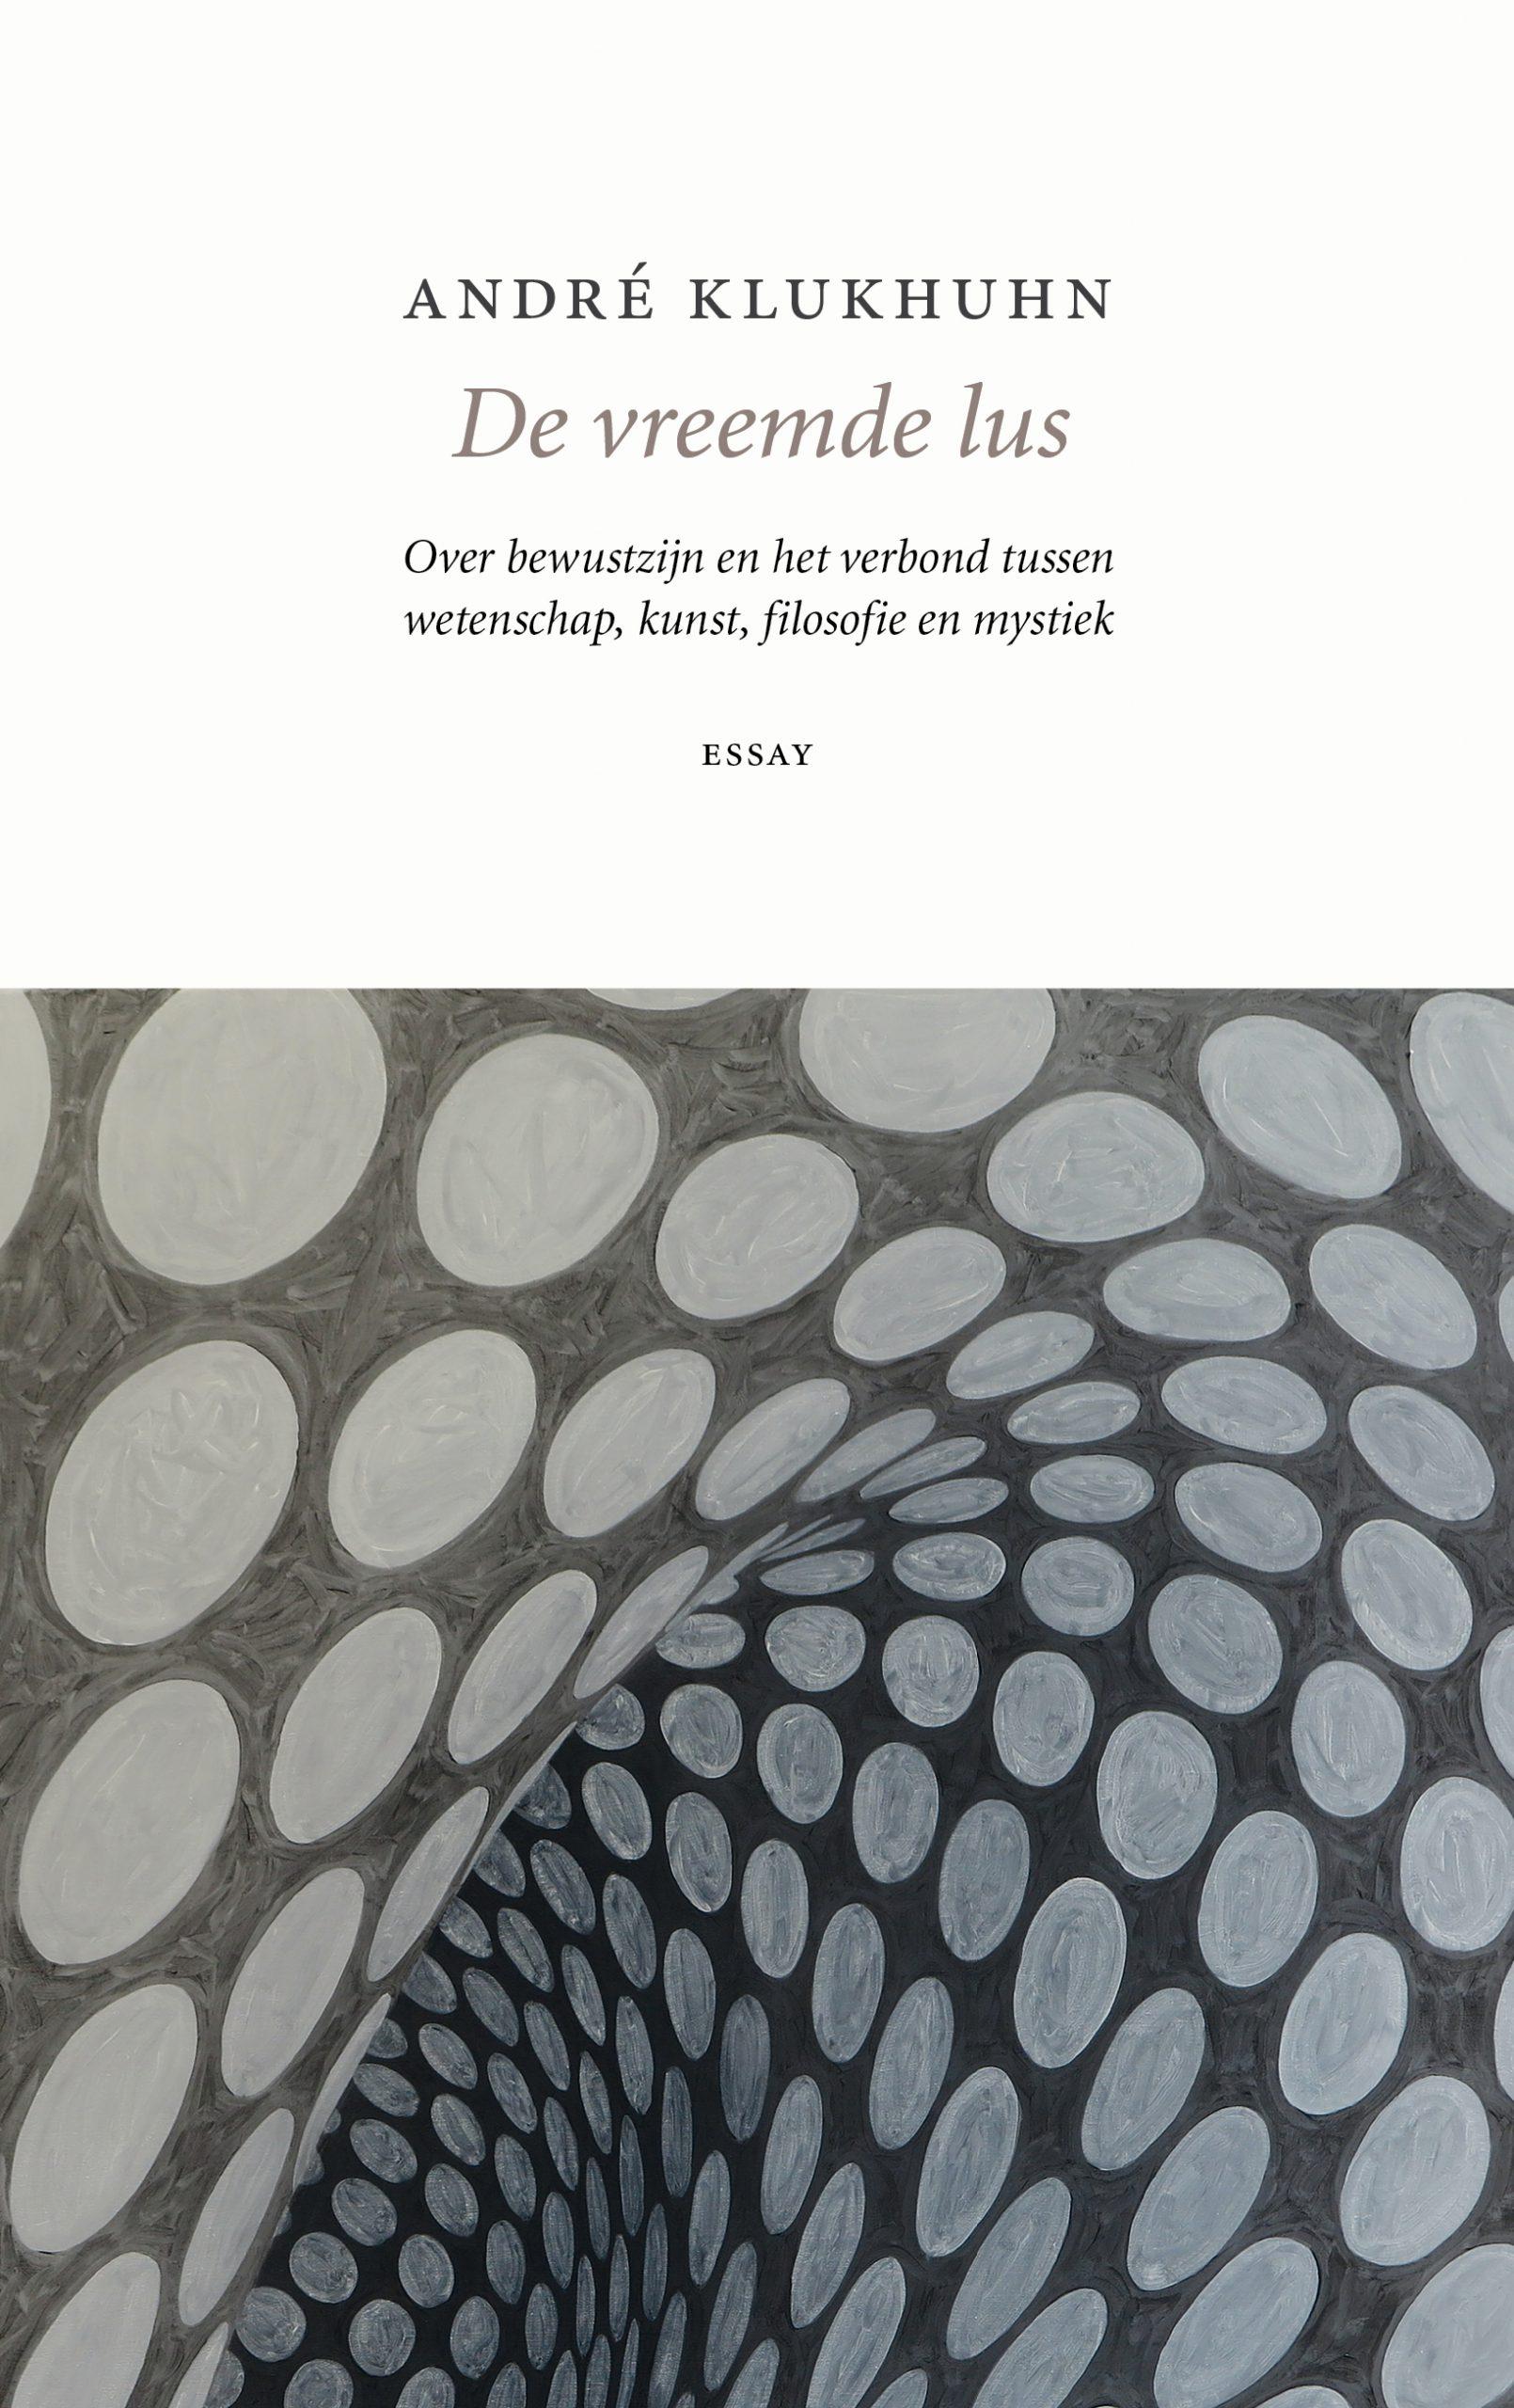 De vreemde lus – André Klukhuhn